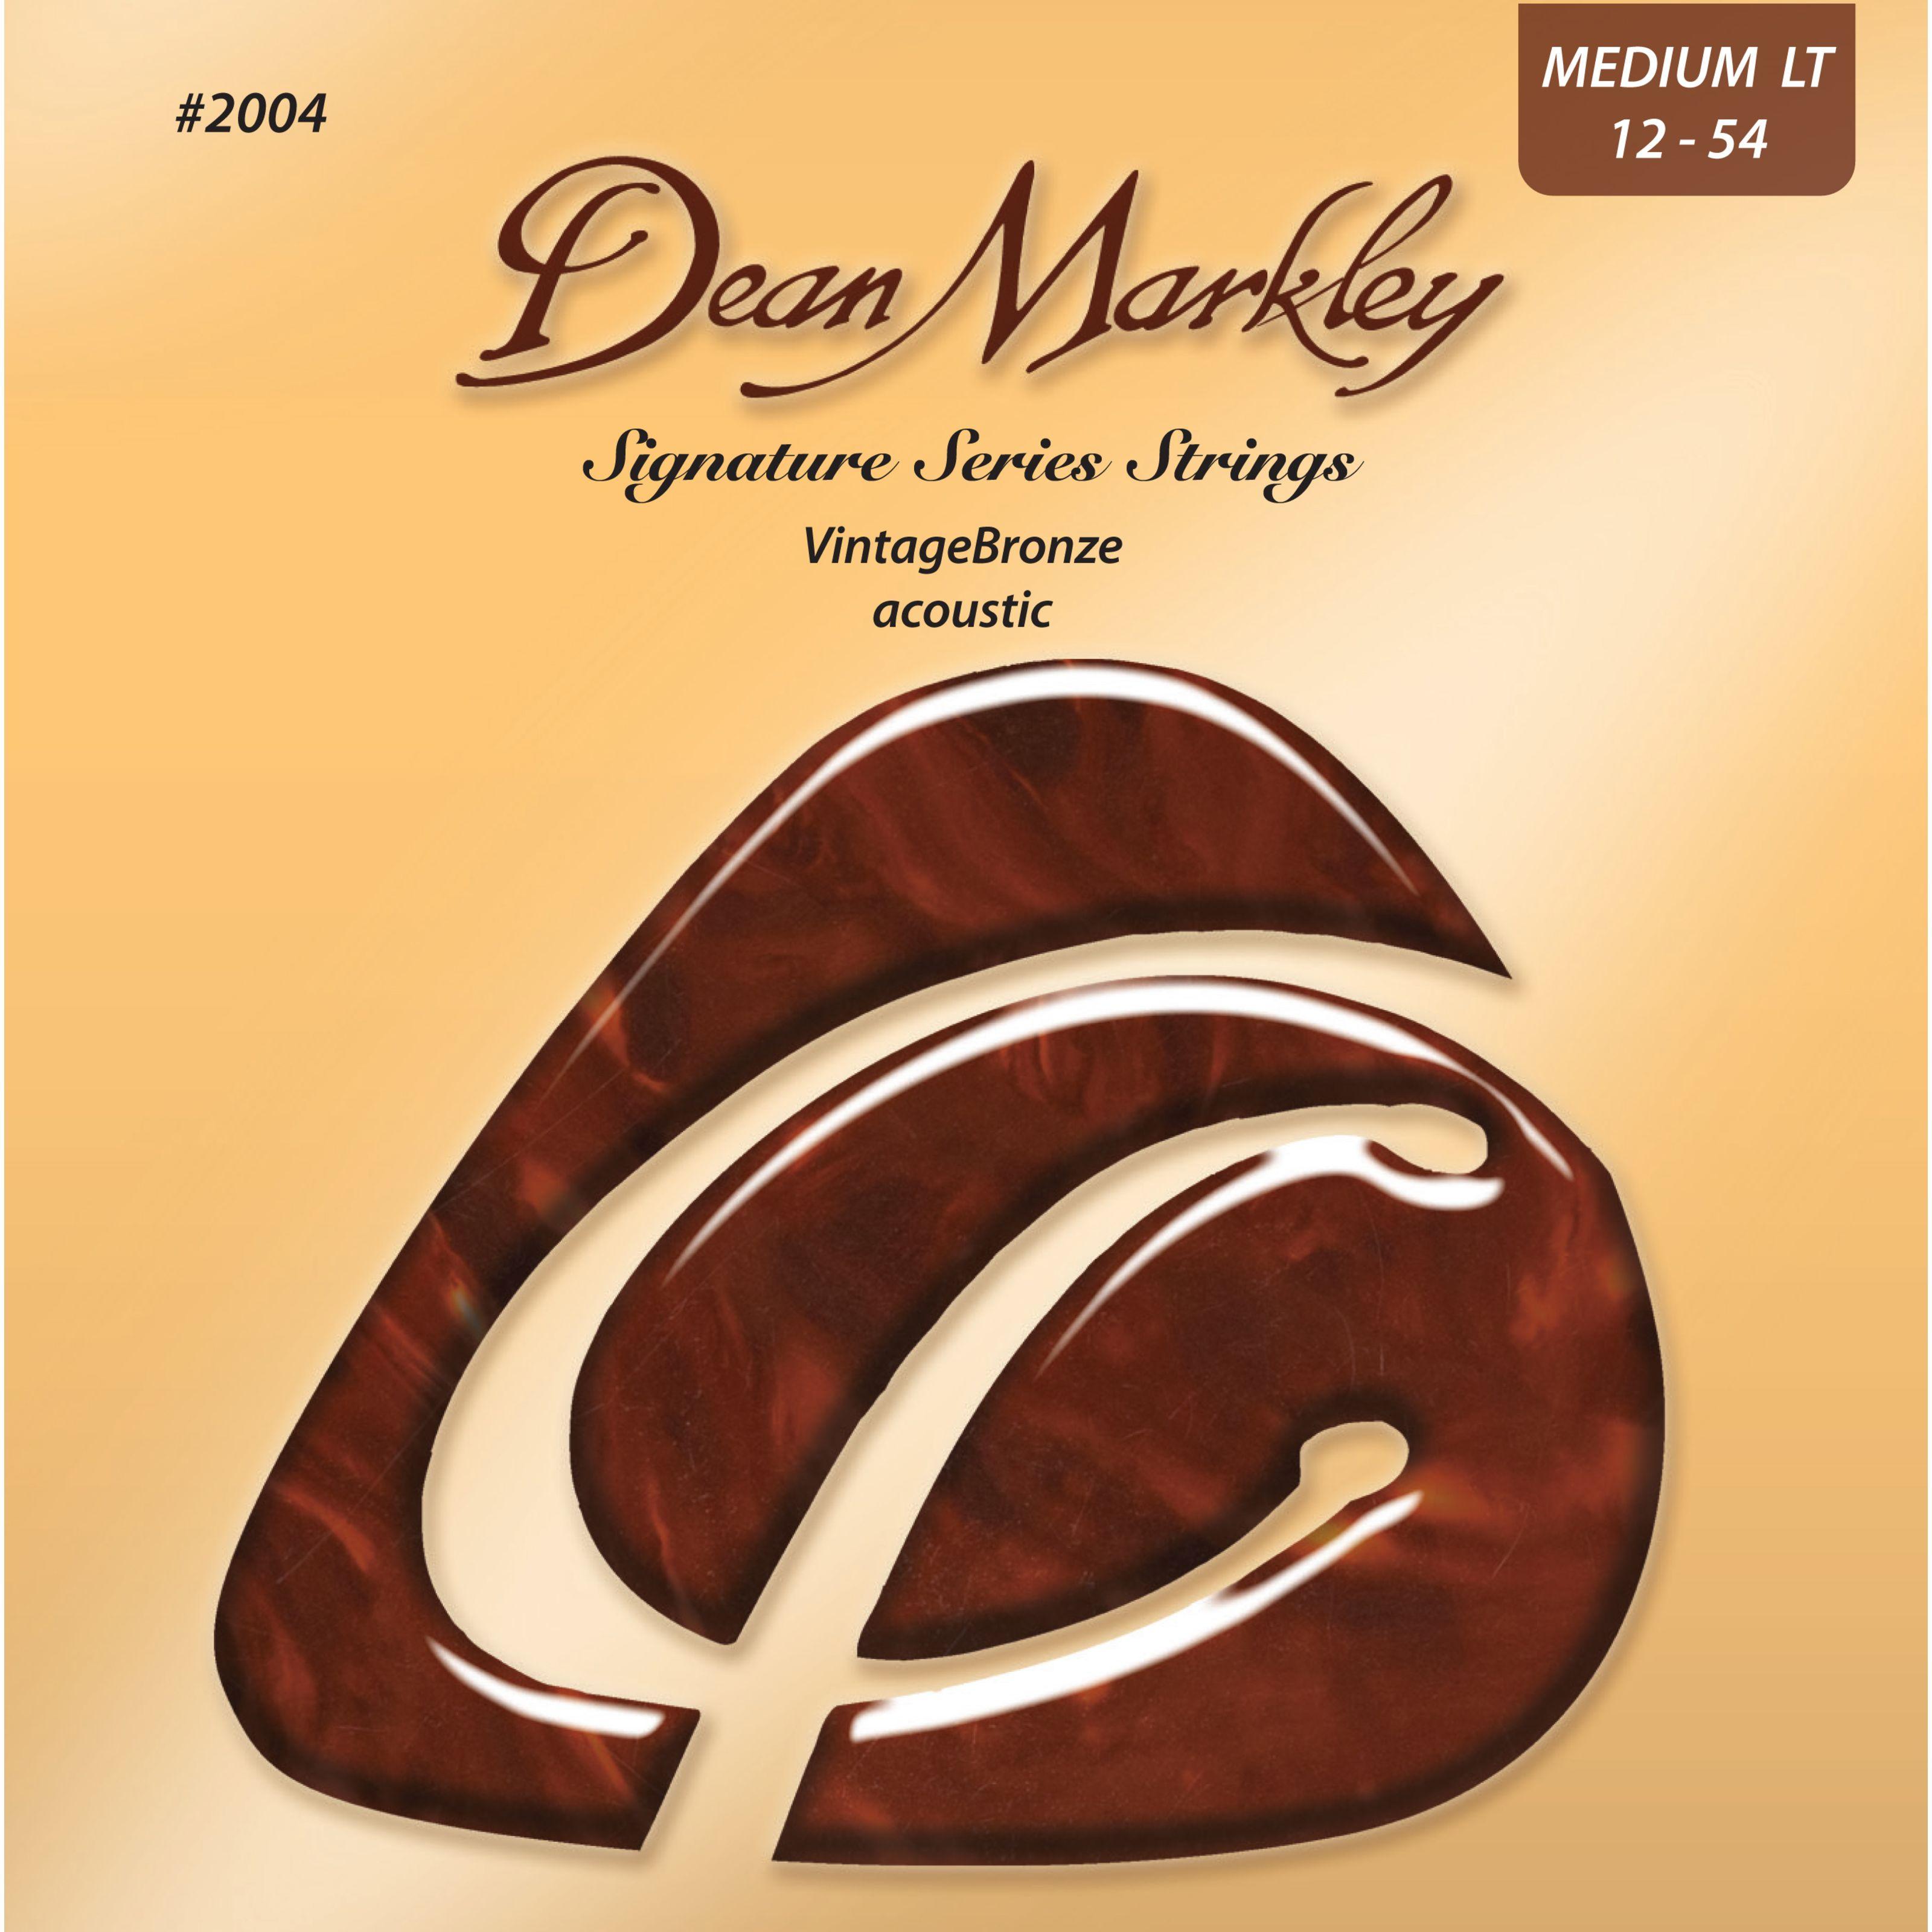 Dean Markley - A-Git.Saiten 12-54 2004 ML VintageBronze Acoustic DM2004